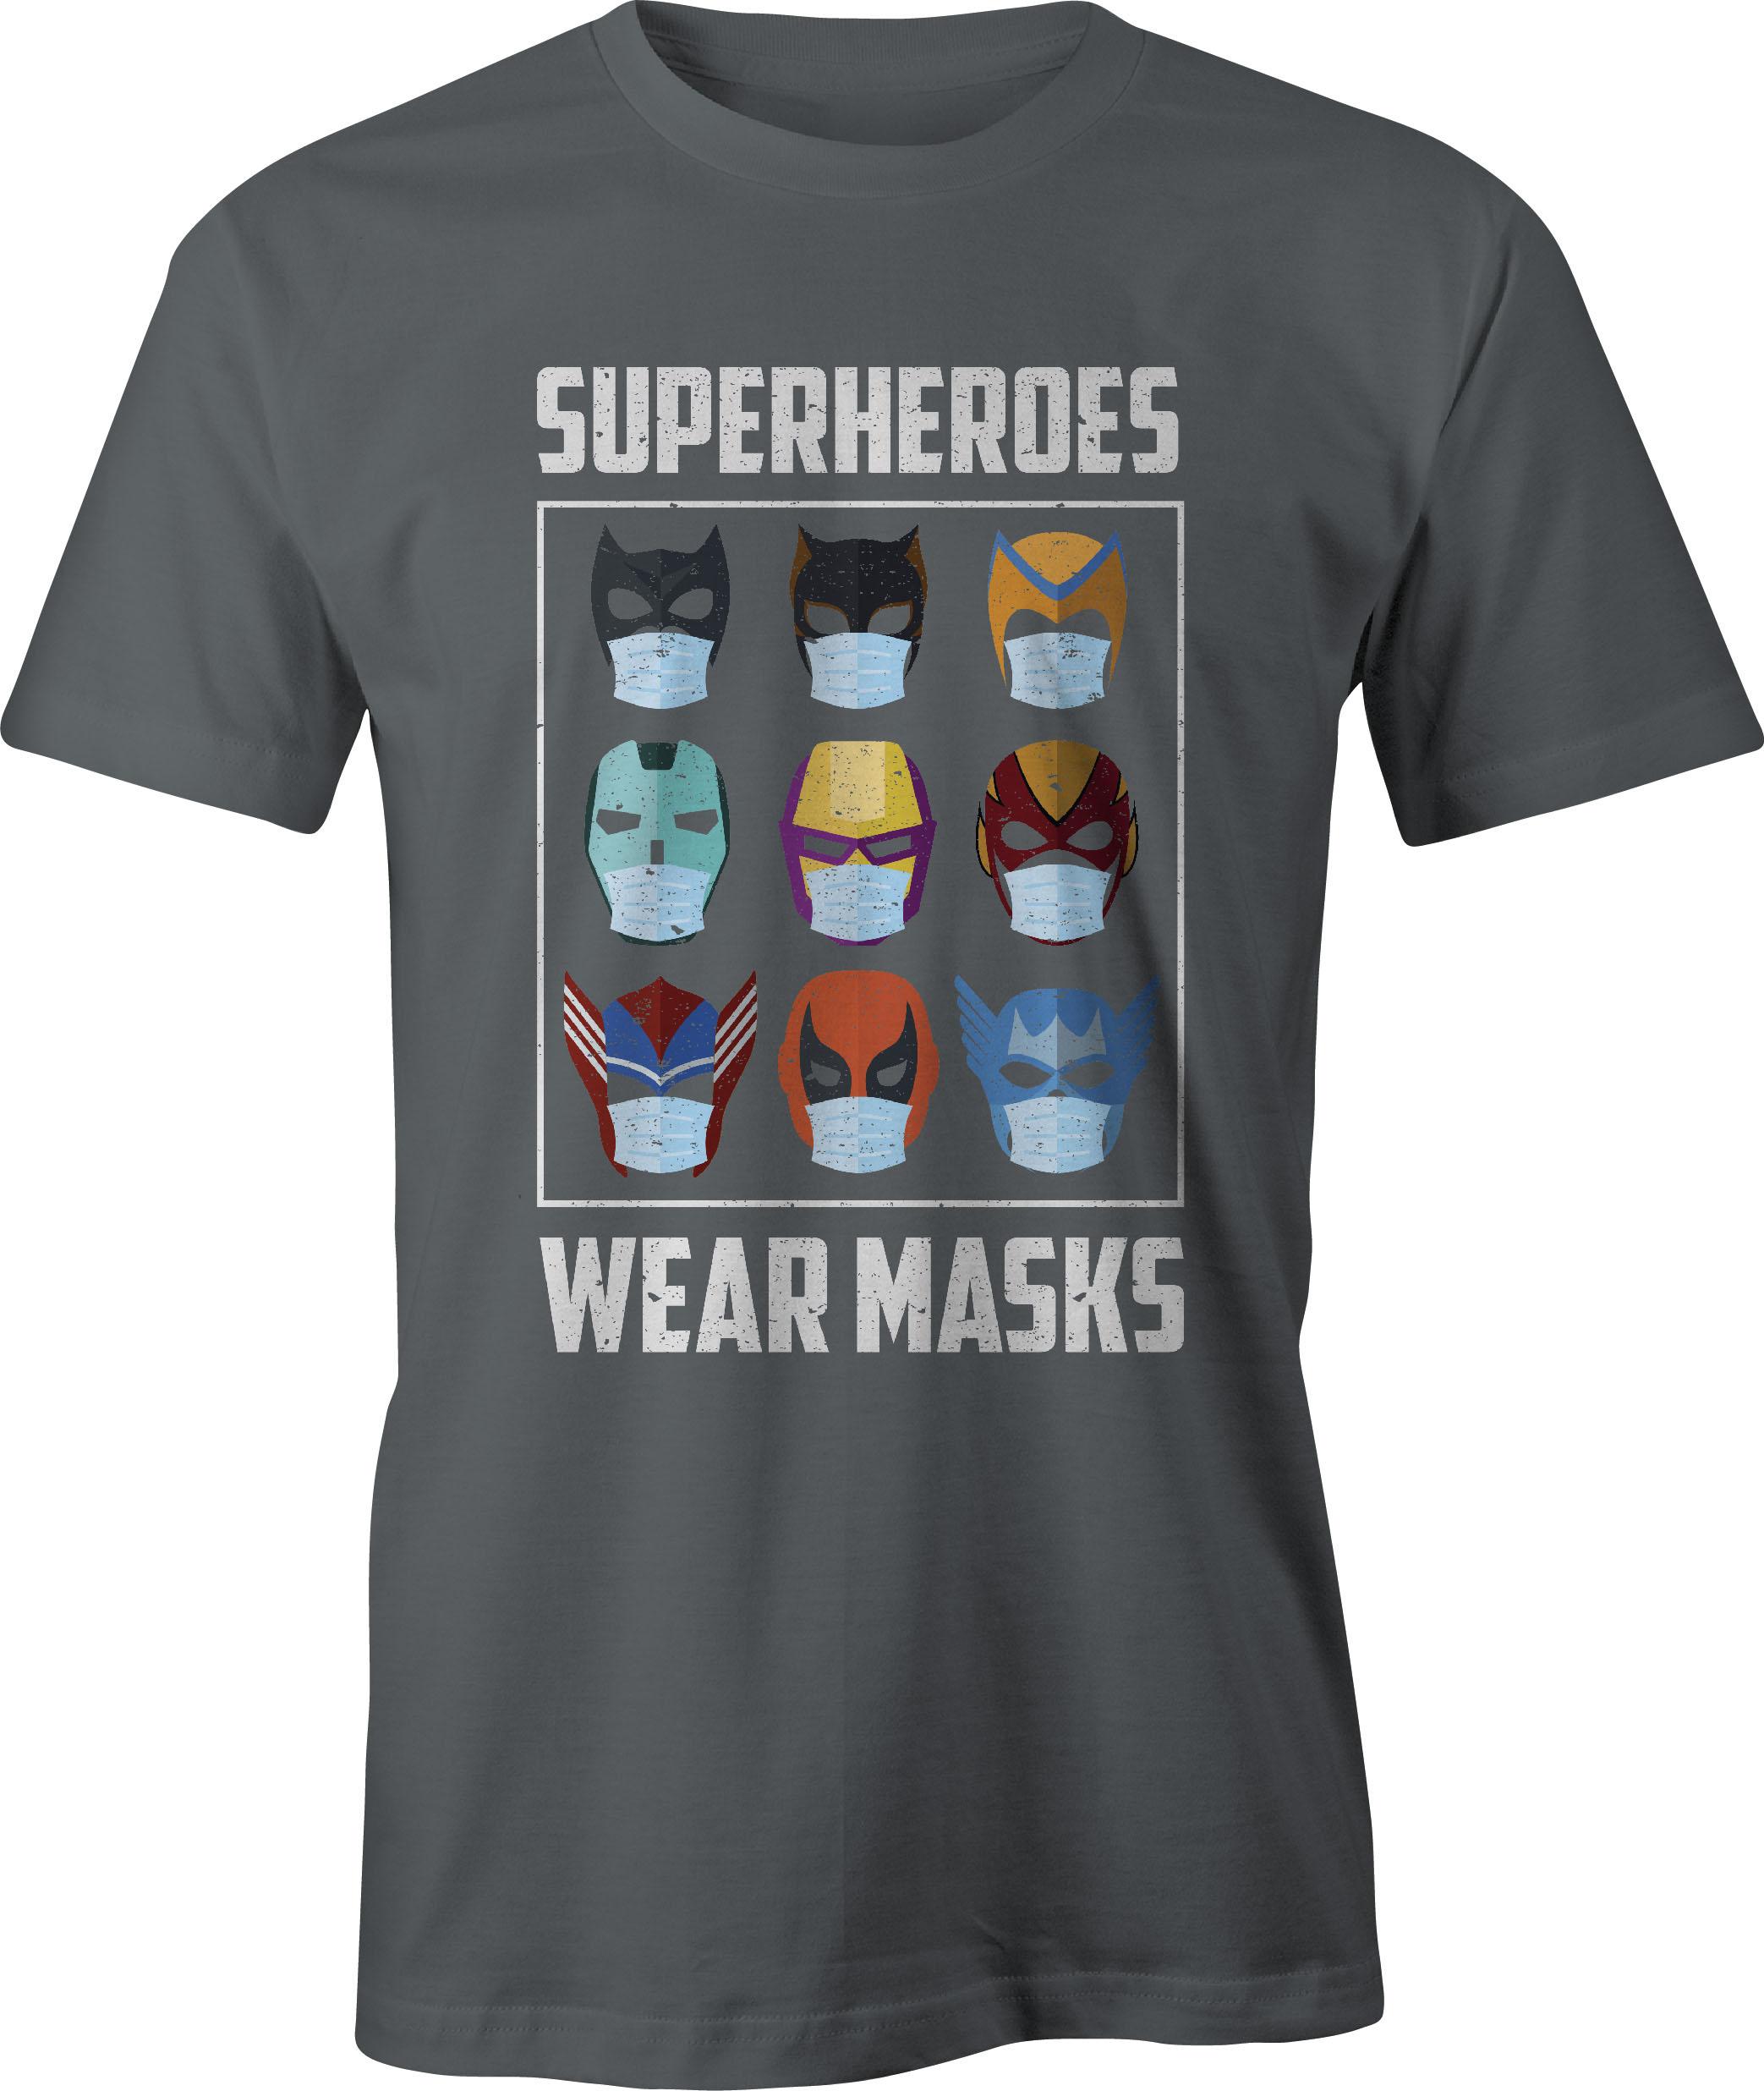 Superheroes Wear Masks T-Shirt in Charcoal